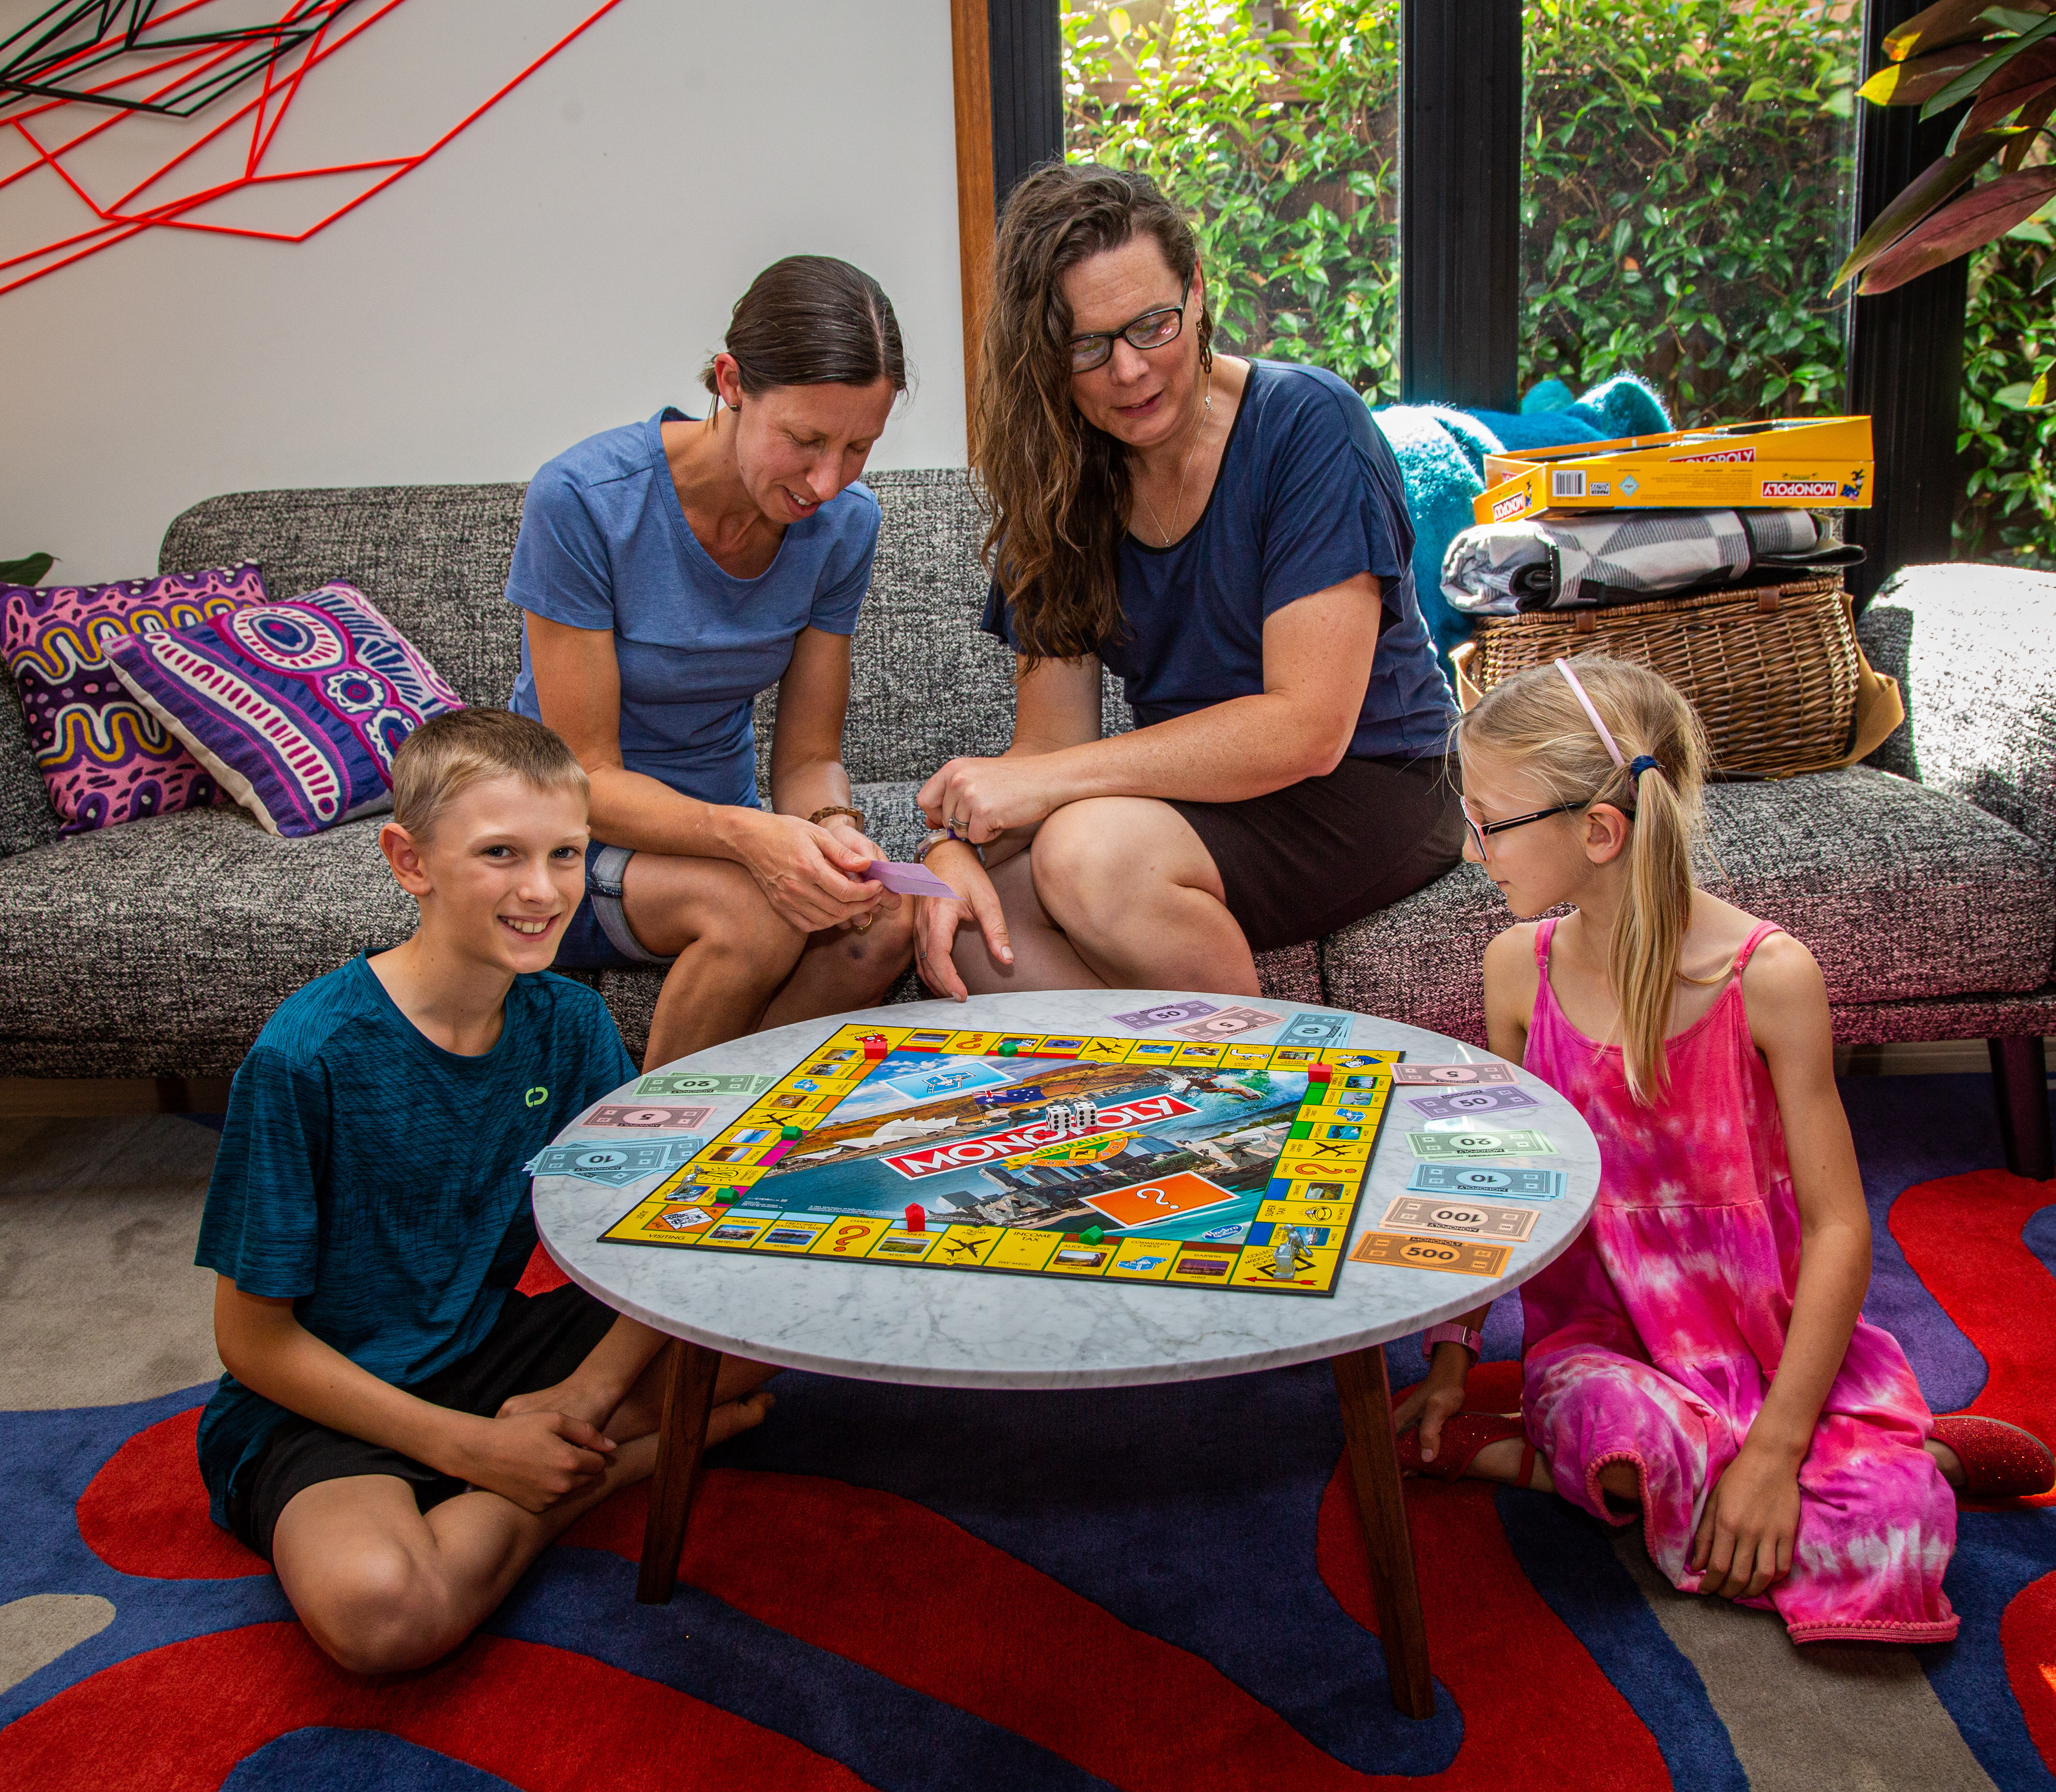 LGBTQ Family playing Monopoly